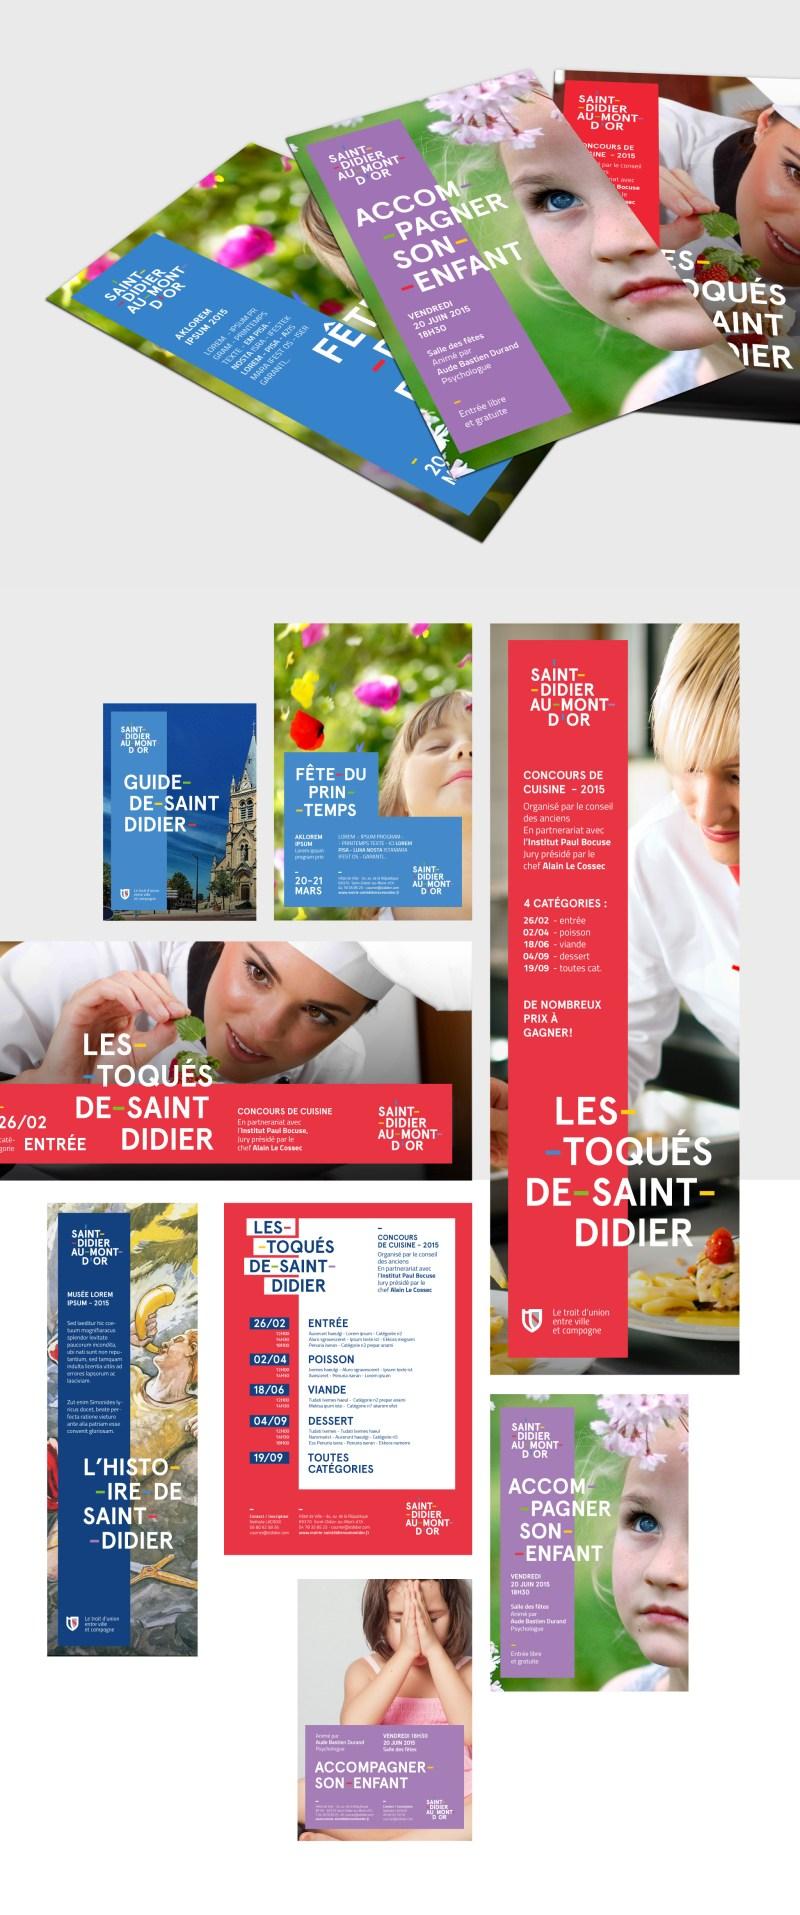 behance-poster-saint-didier-identite